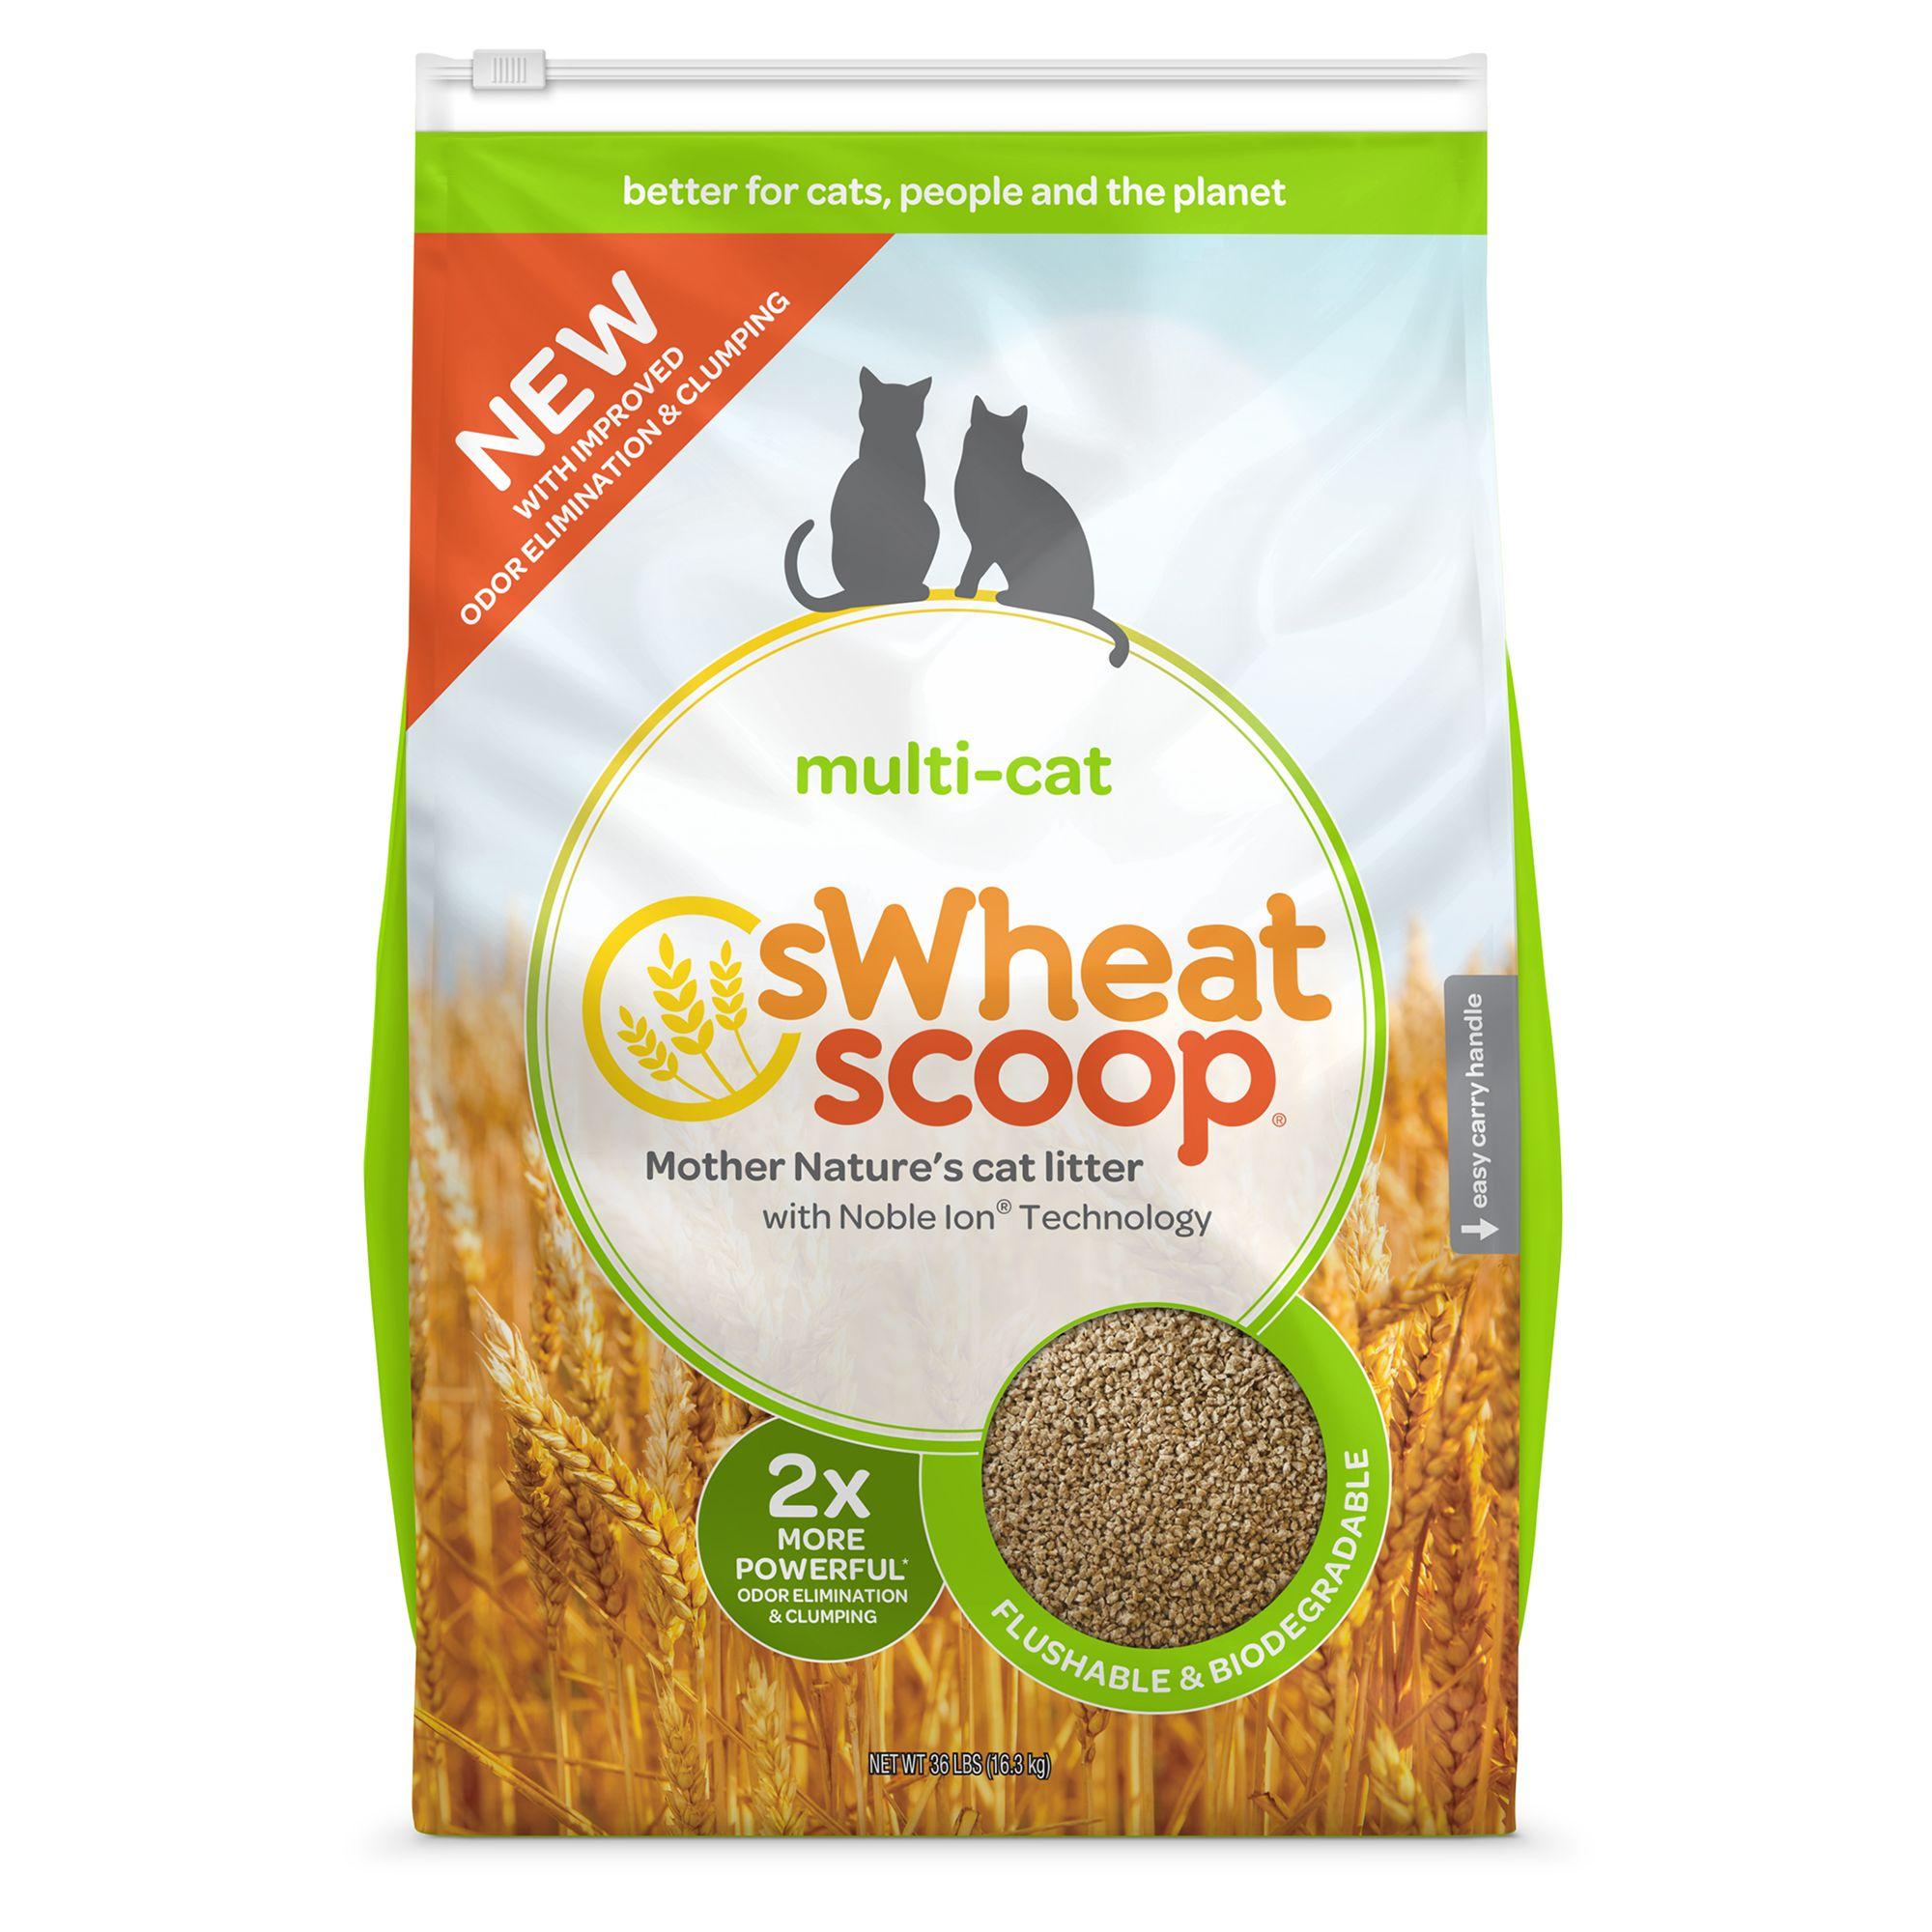 sWheat Scoop Multi-Cat Natural Cat Litter - Clumping